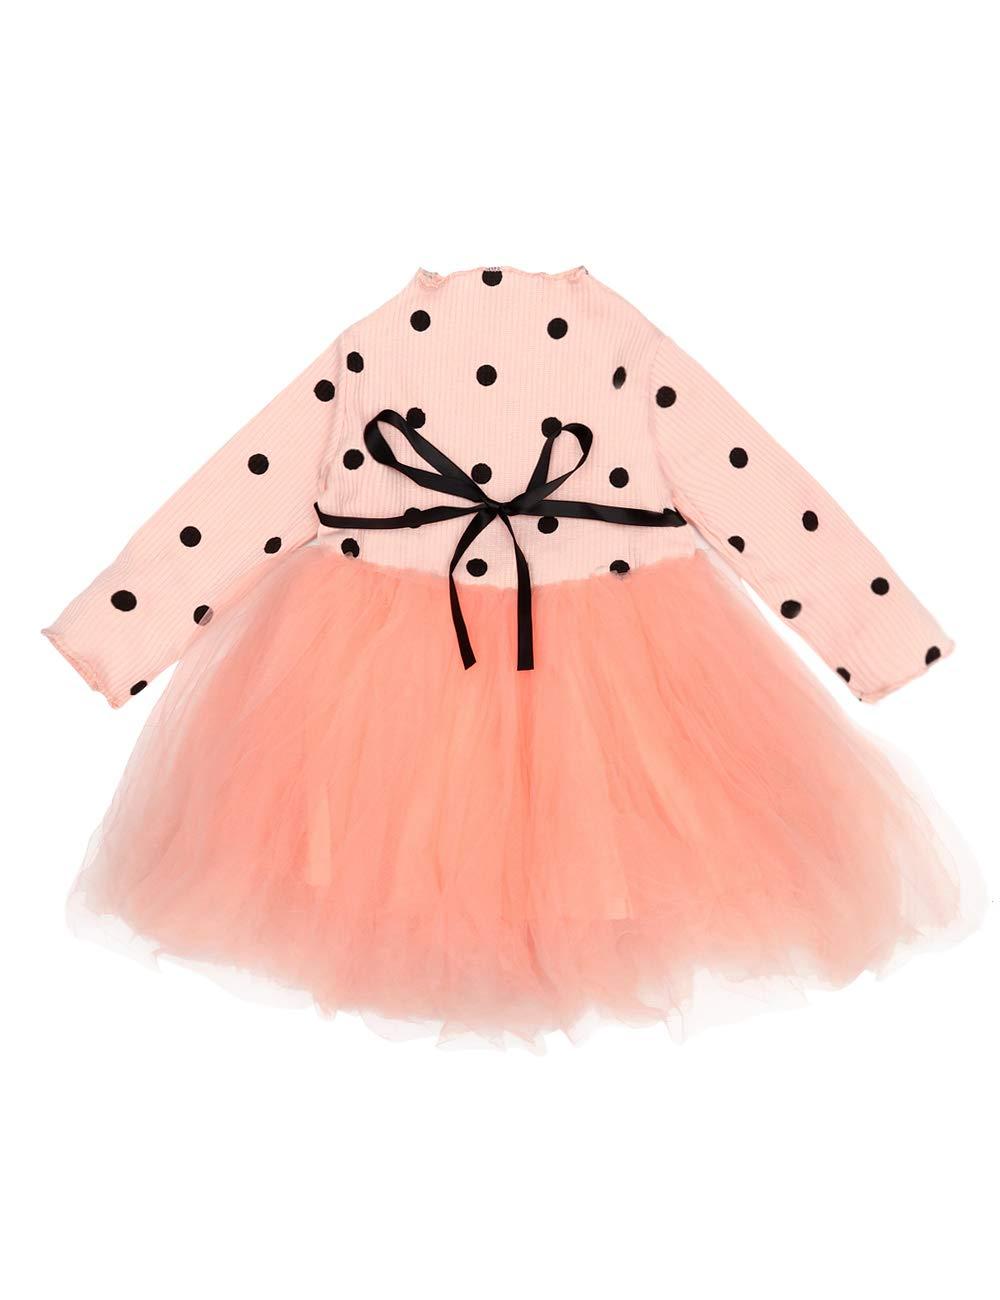 Toddler Infant Baby Girls Clothes Long Sleeve Polka Dot Tutu Tulle Princess Dress One-Piece Skirt Set